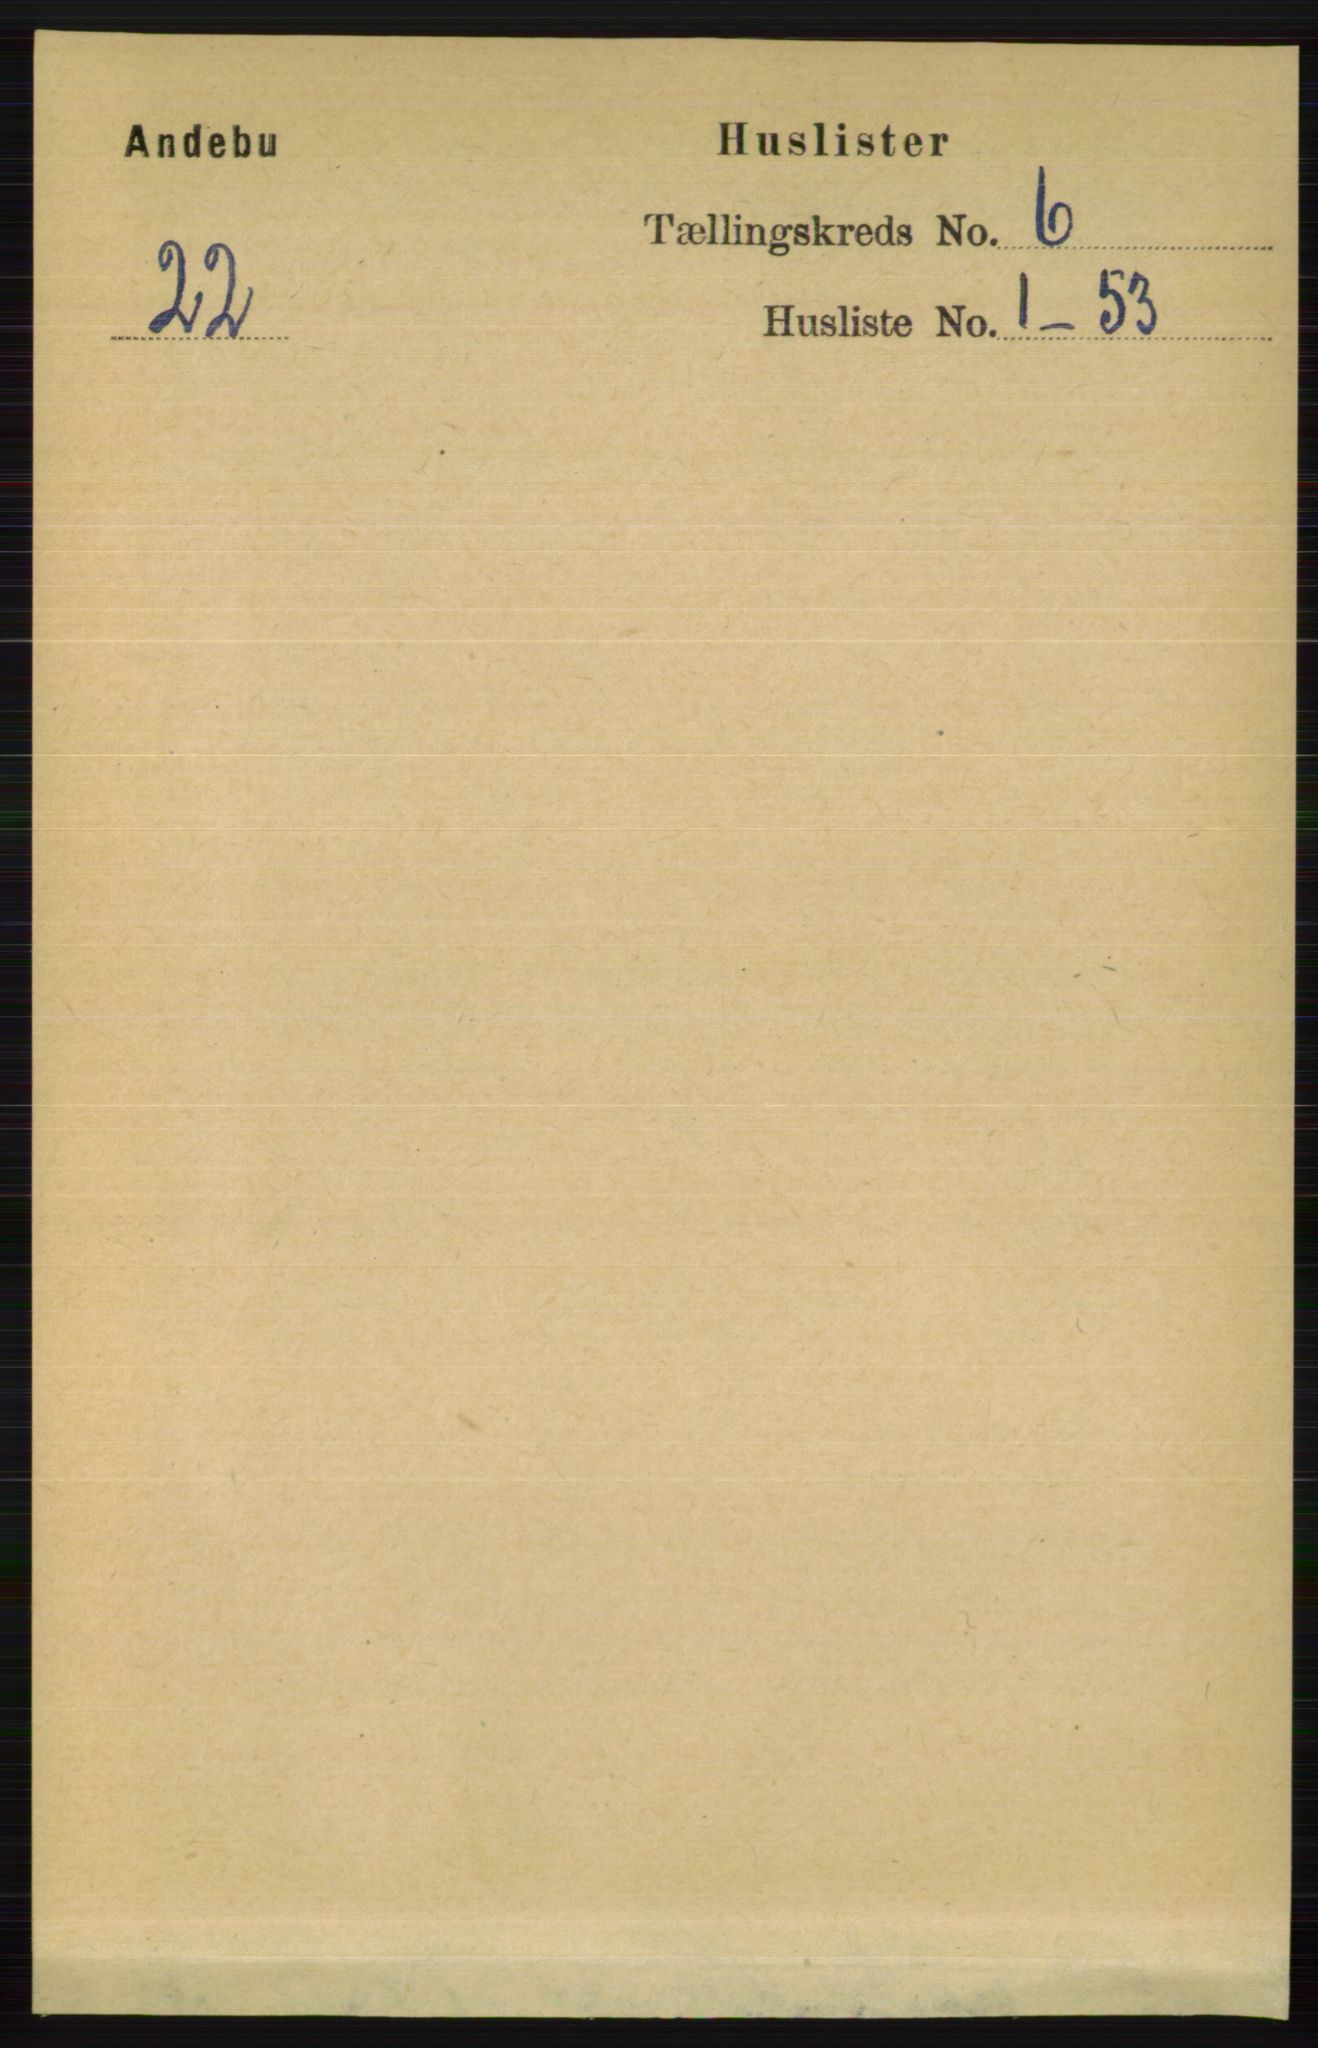 RA, Folketelling 1891 for 0719 Andebu herred, 1891, s. 3062